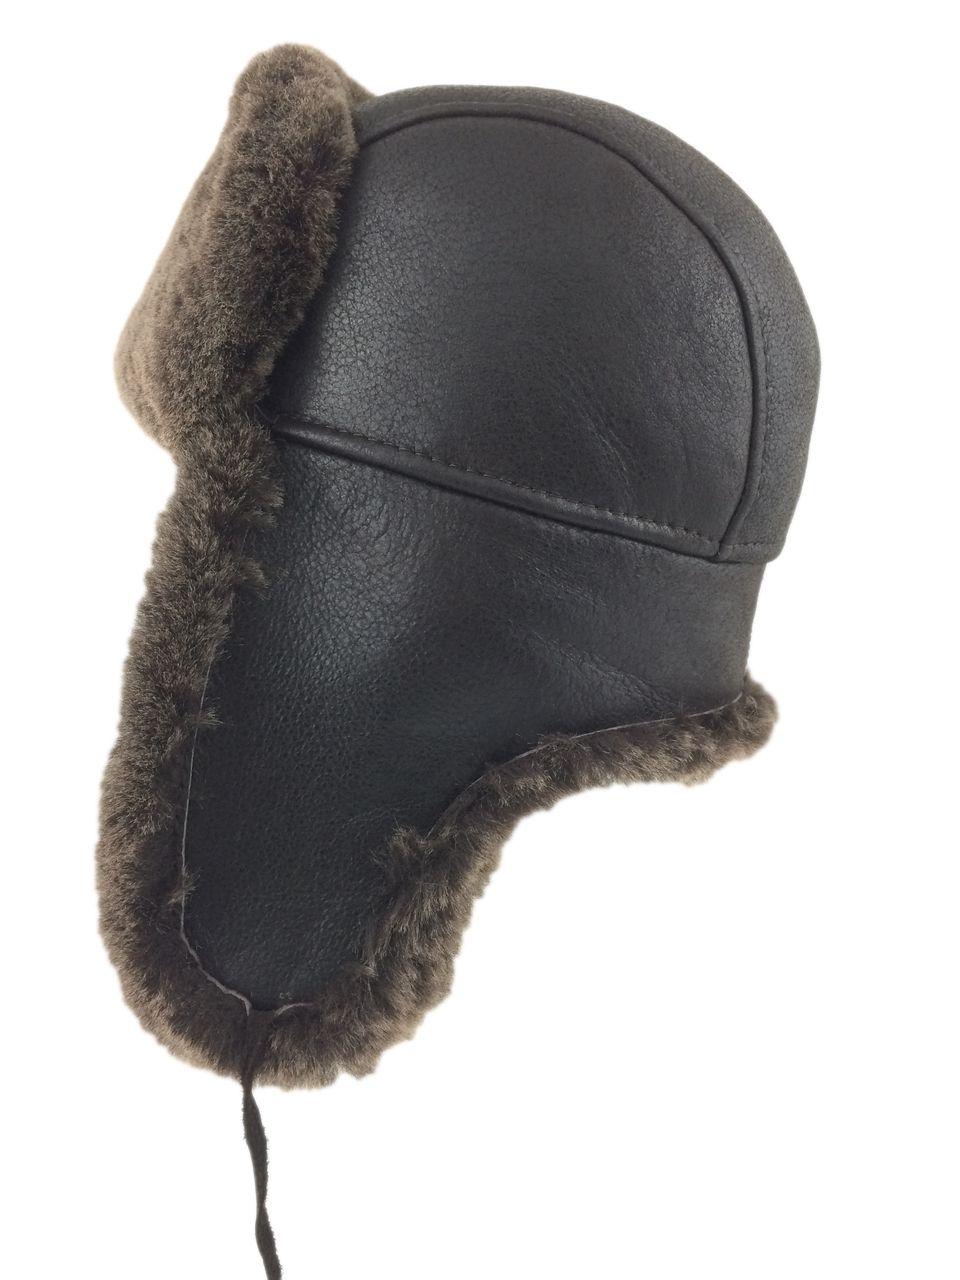 a7159ee9b Shearling Sheepskin Aviator Winter Fur Hat - Brown | winter ...